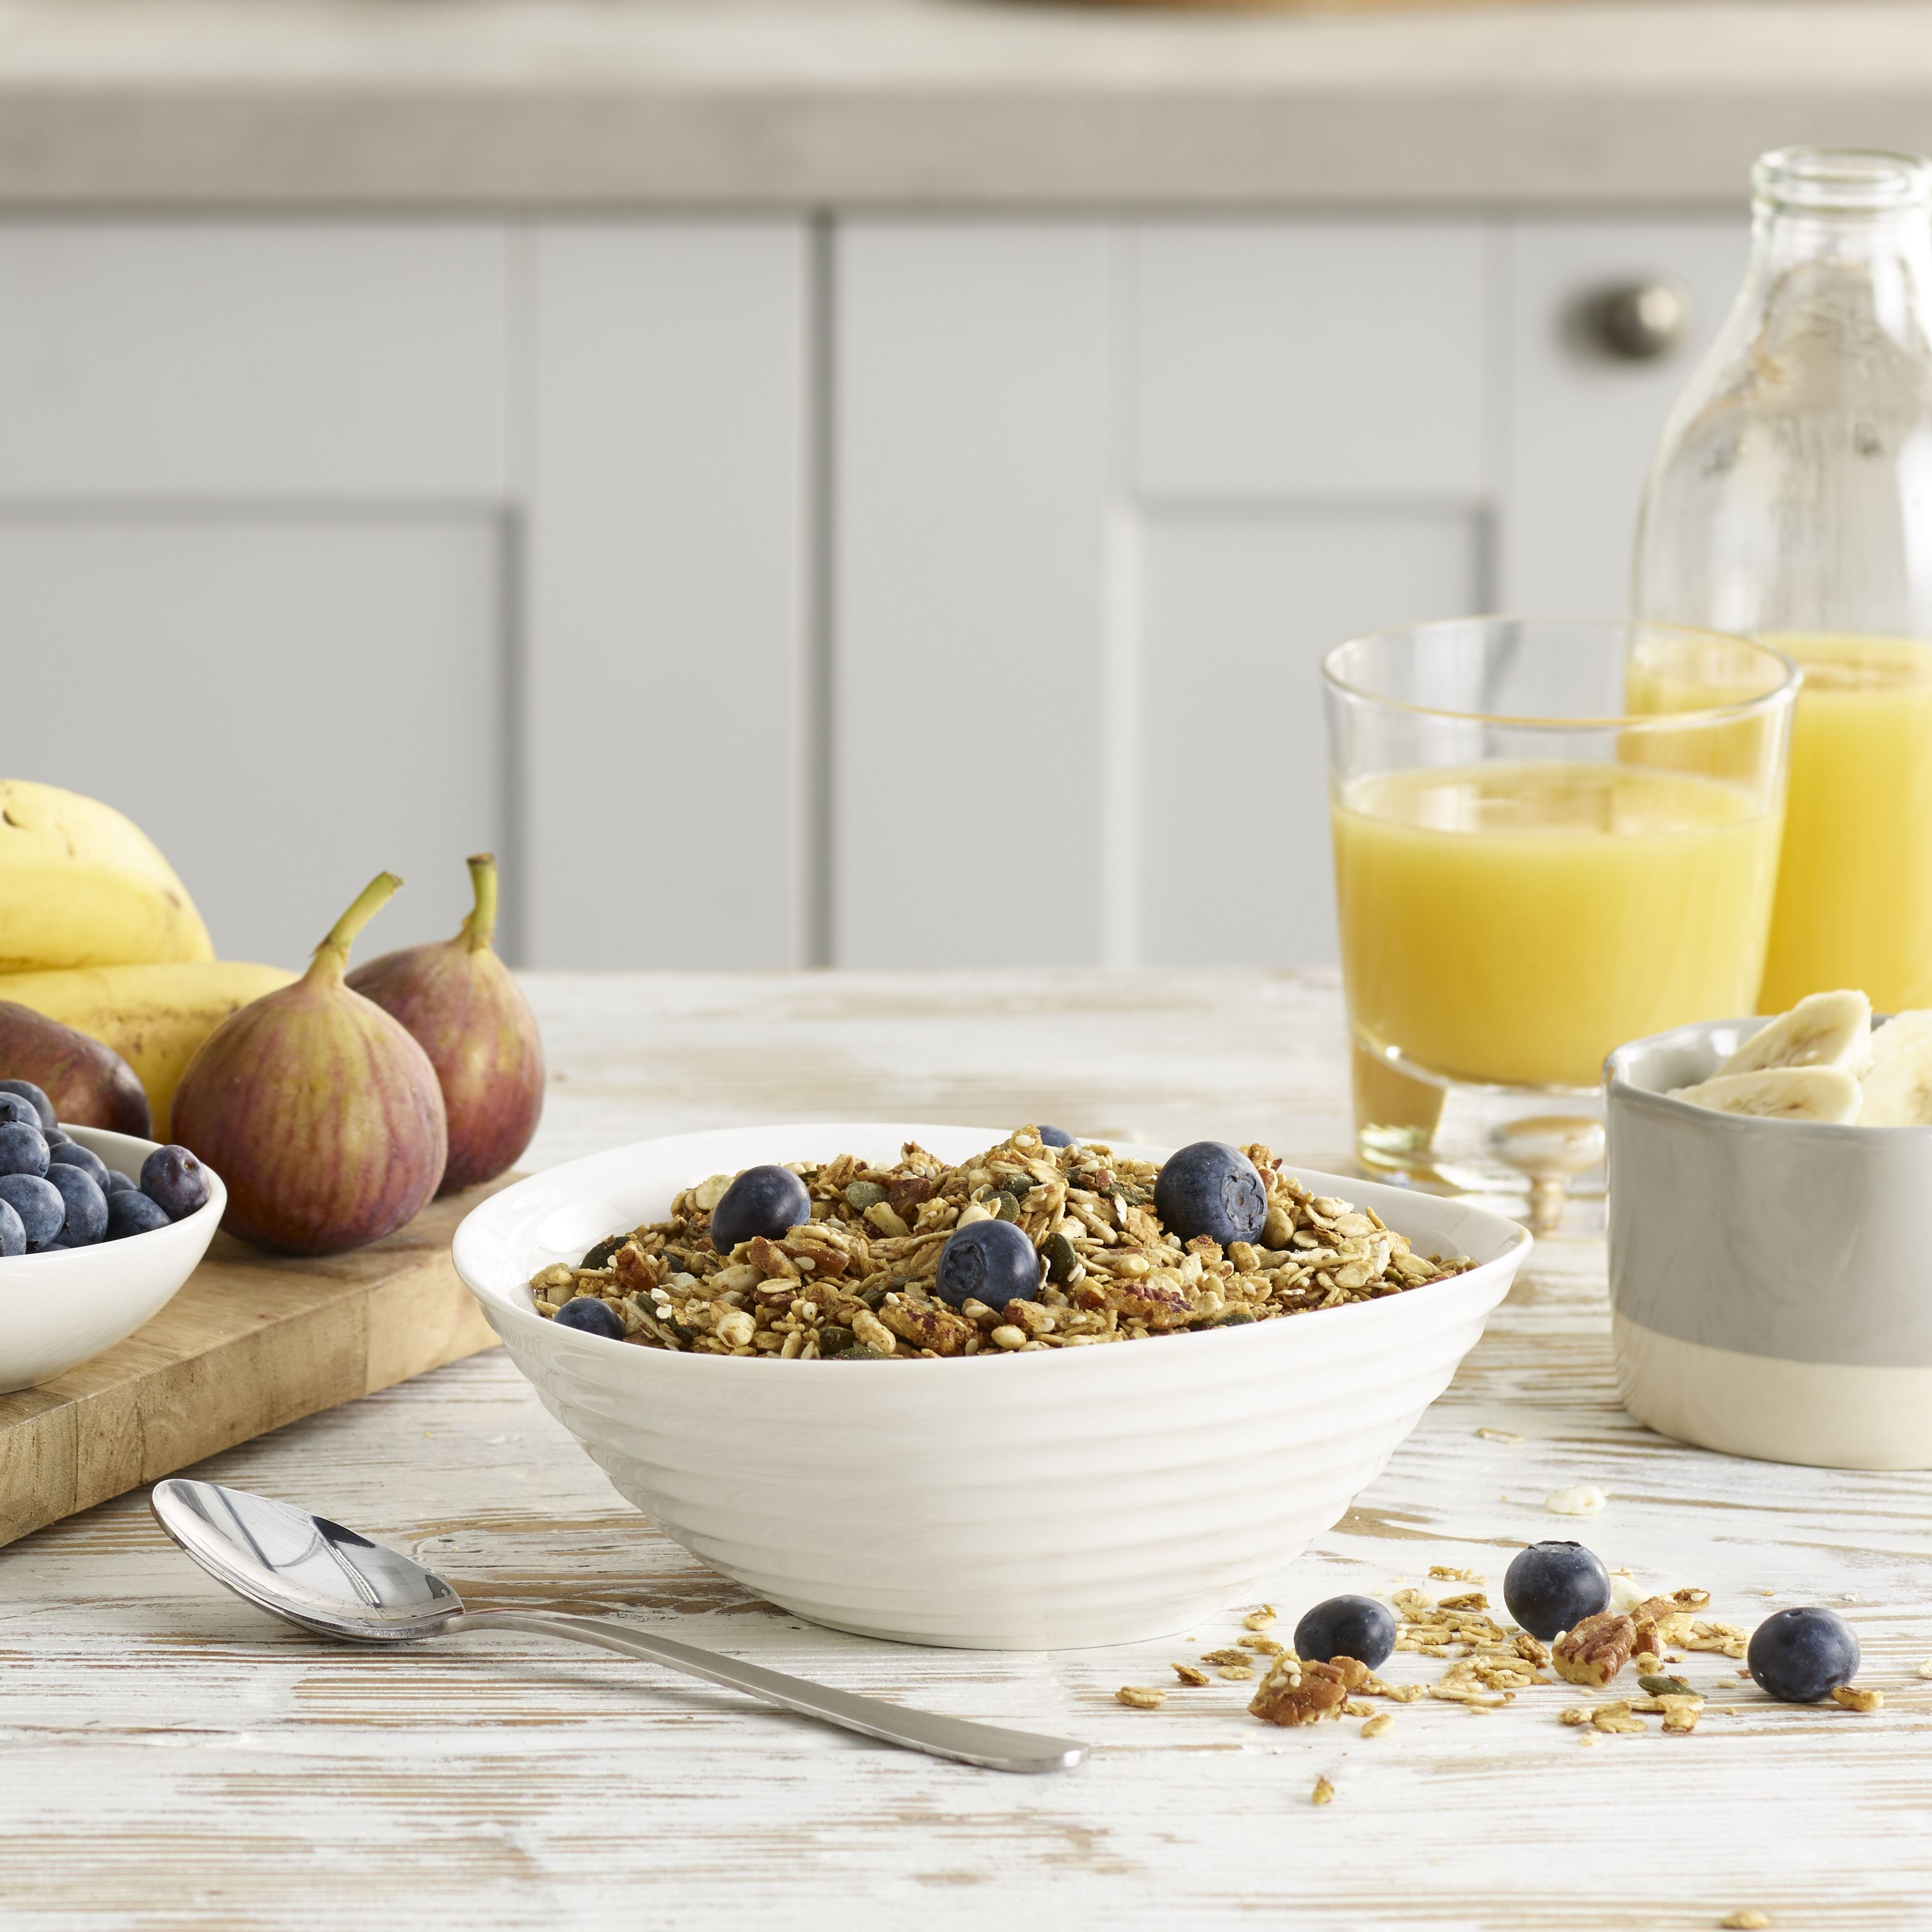 The Ludlow Nut Company Luxury Muesli - Fruit Nut & Seed, 700g